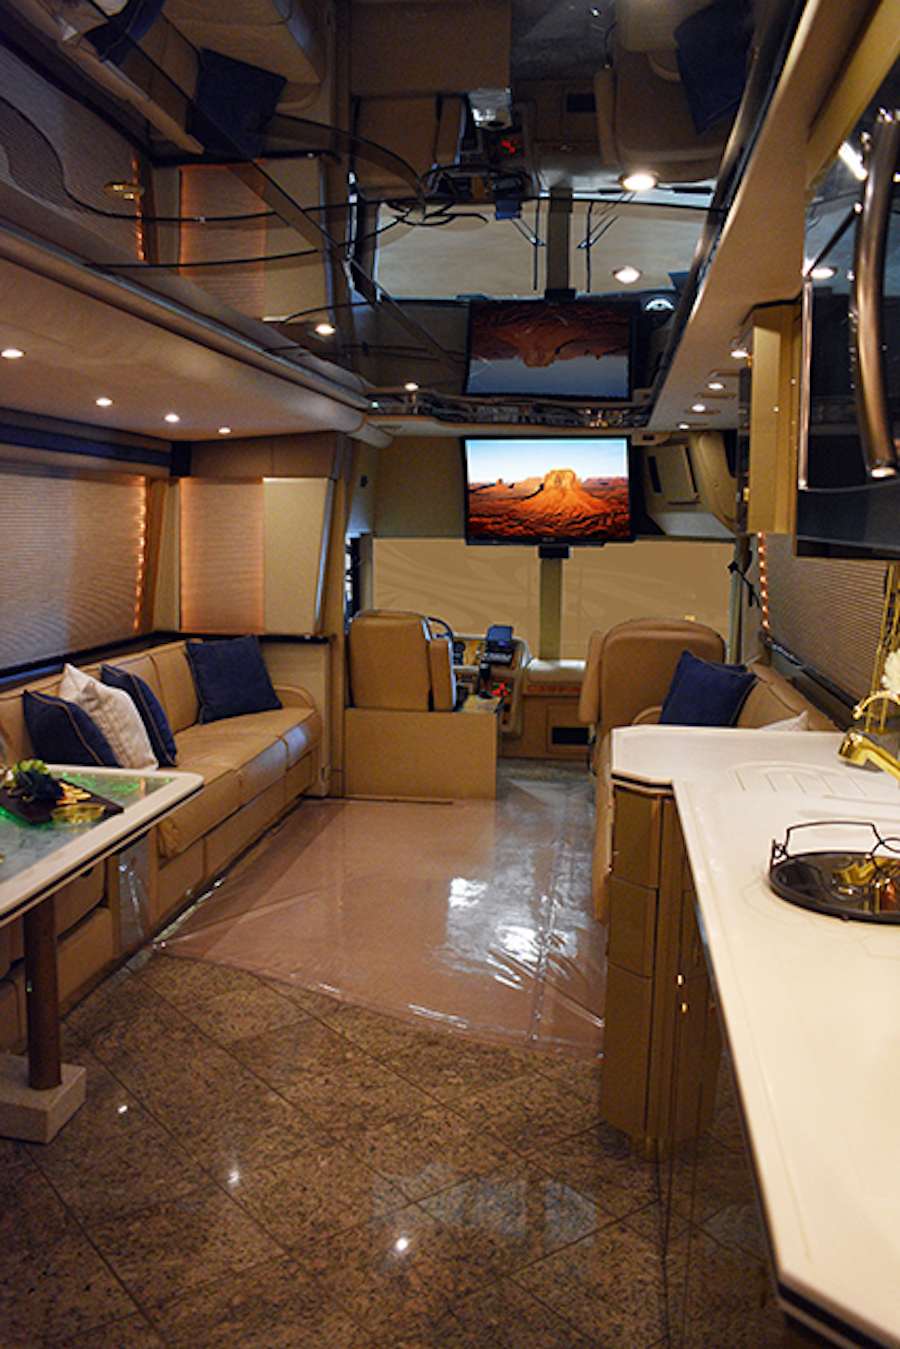 Motorcoach For Sale >> 2000 Prevost Featherlite XLDouble Slide